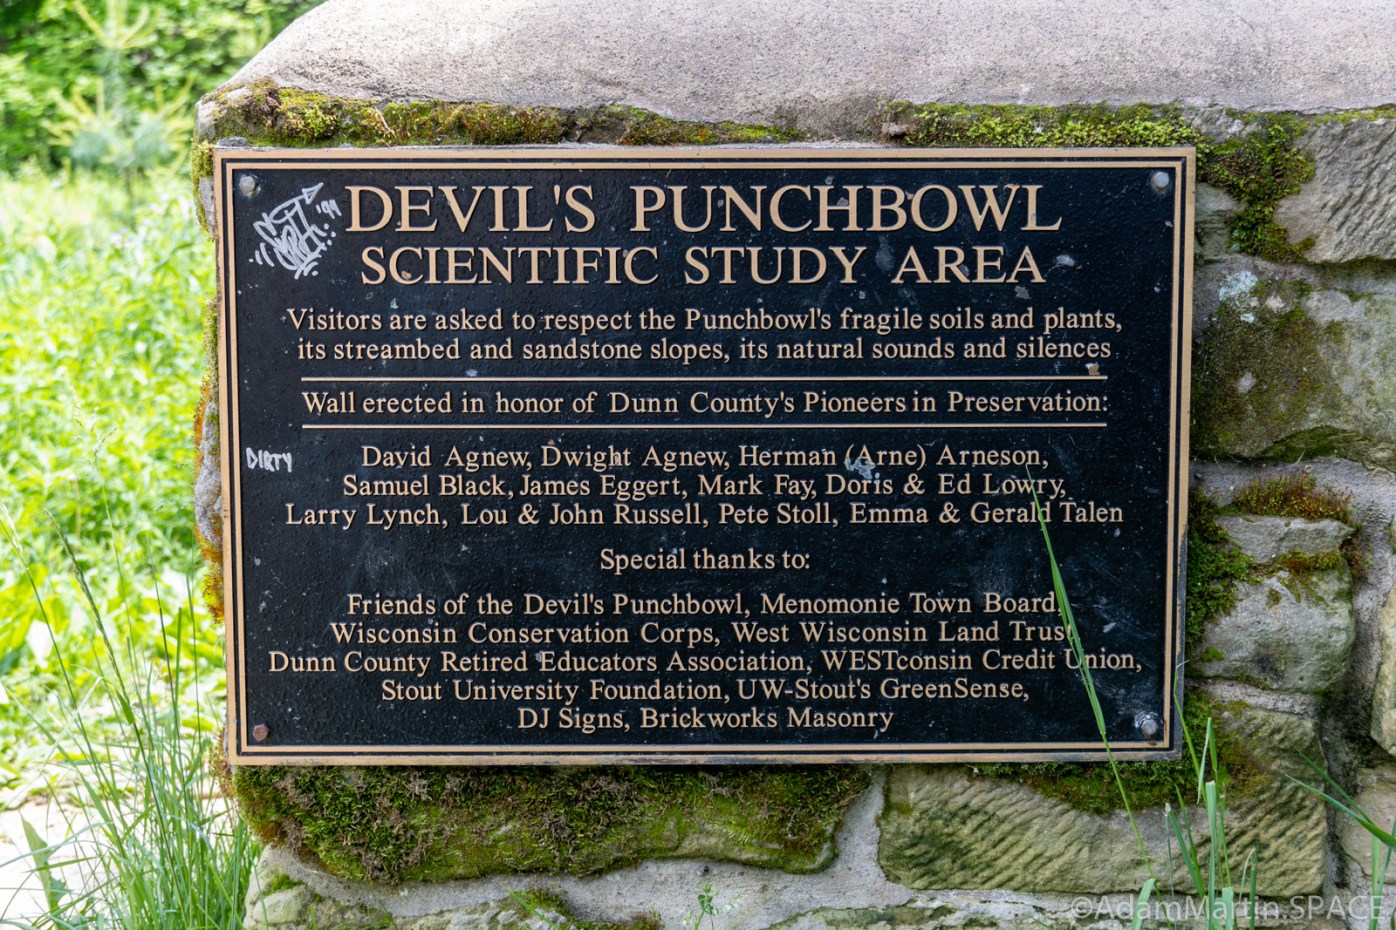 Devil's Punchbowl - Dedication Plaque